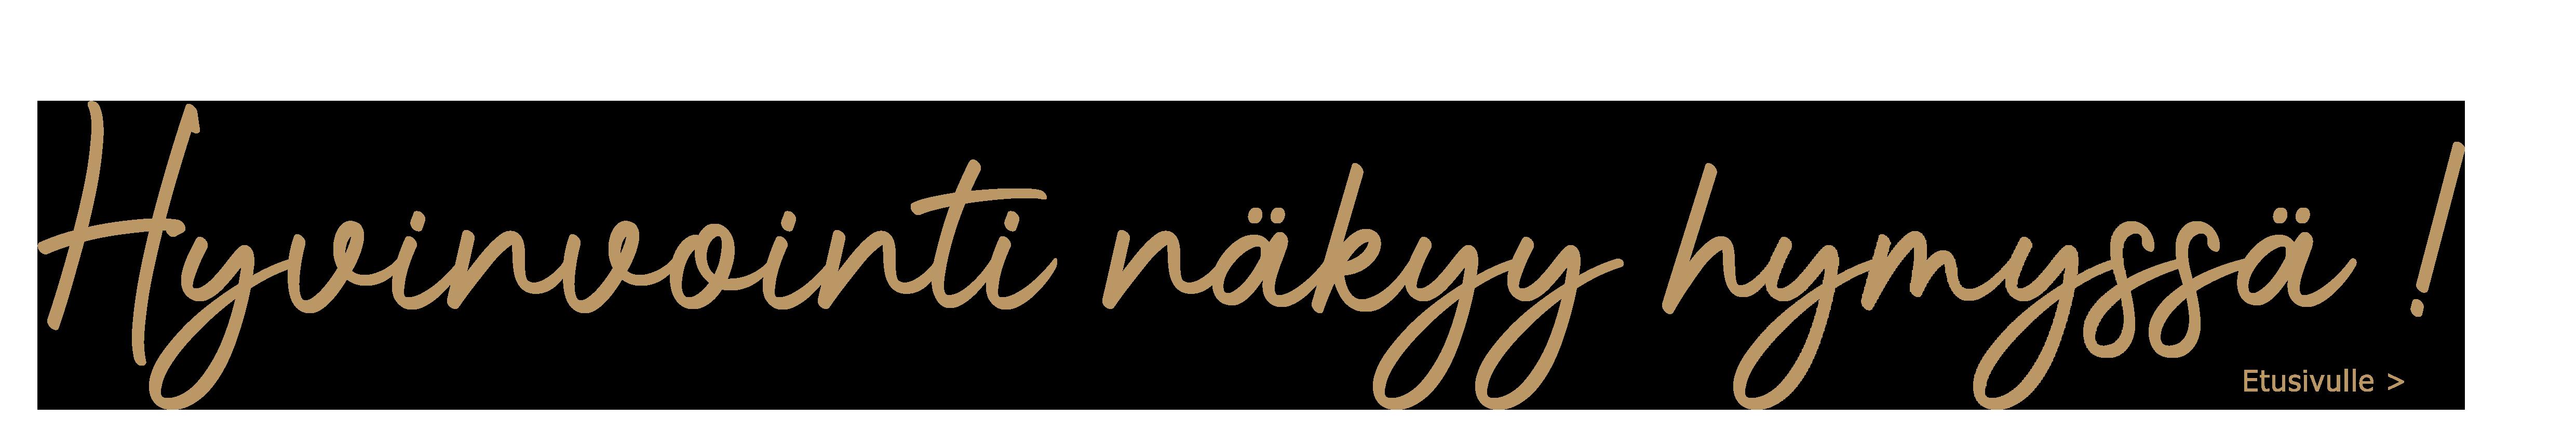 logo2021_hammastikku